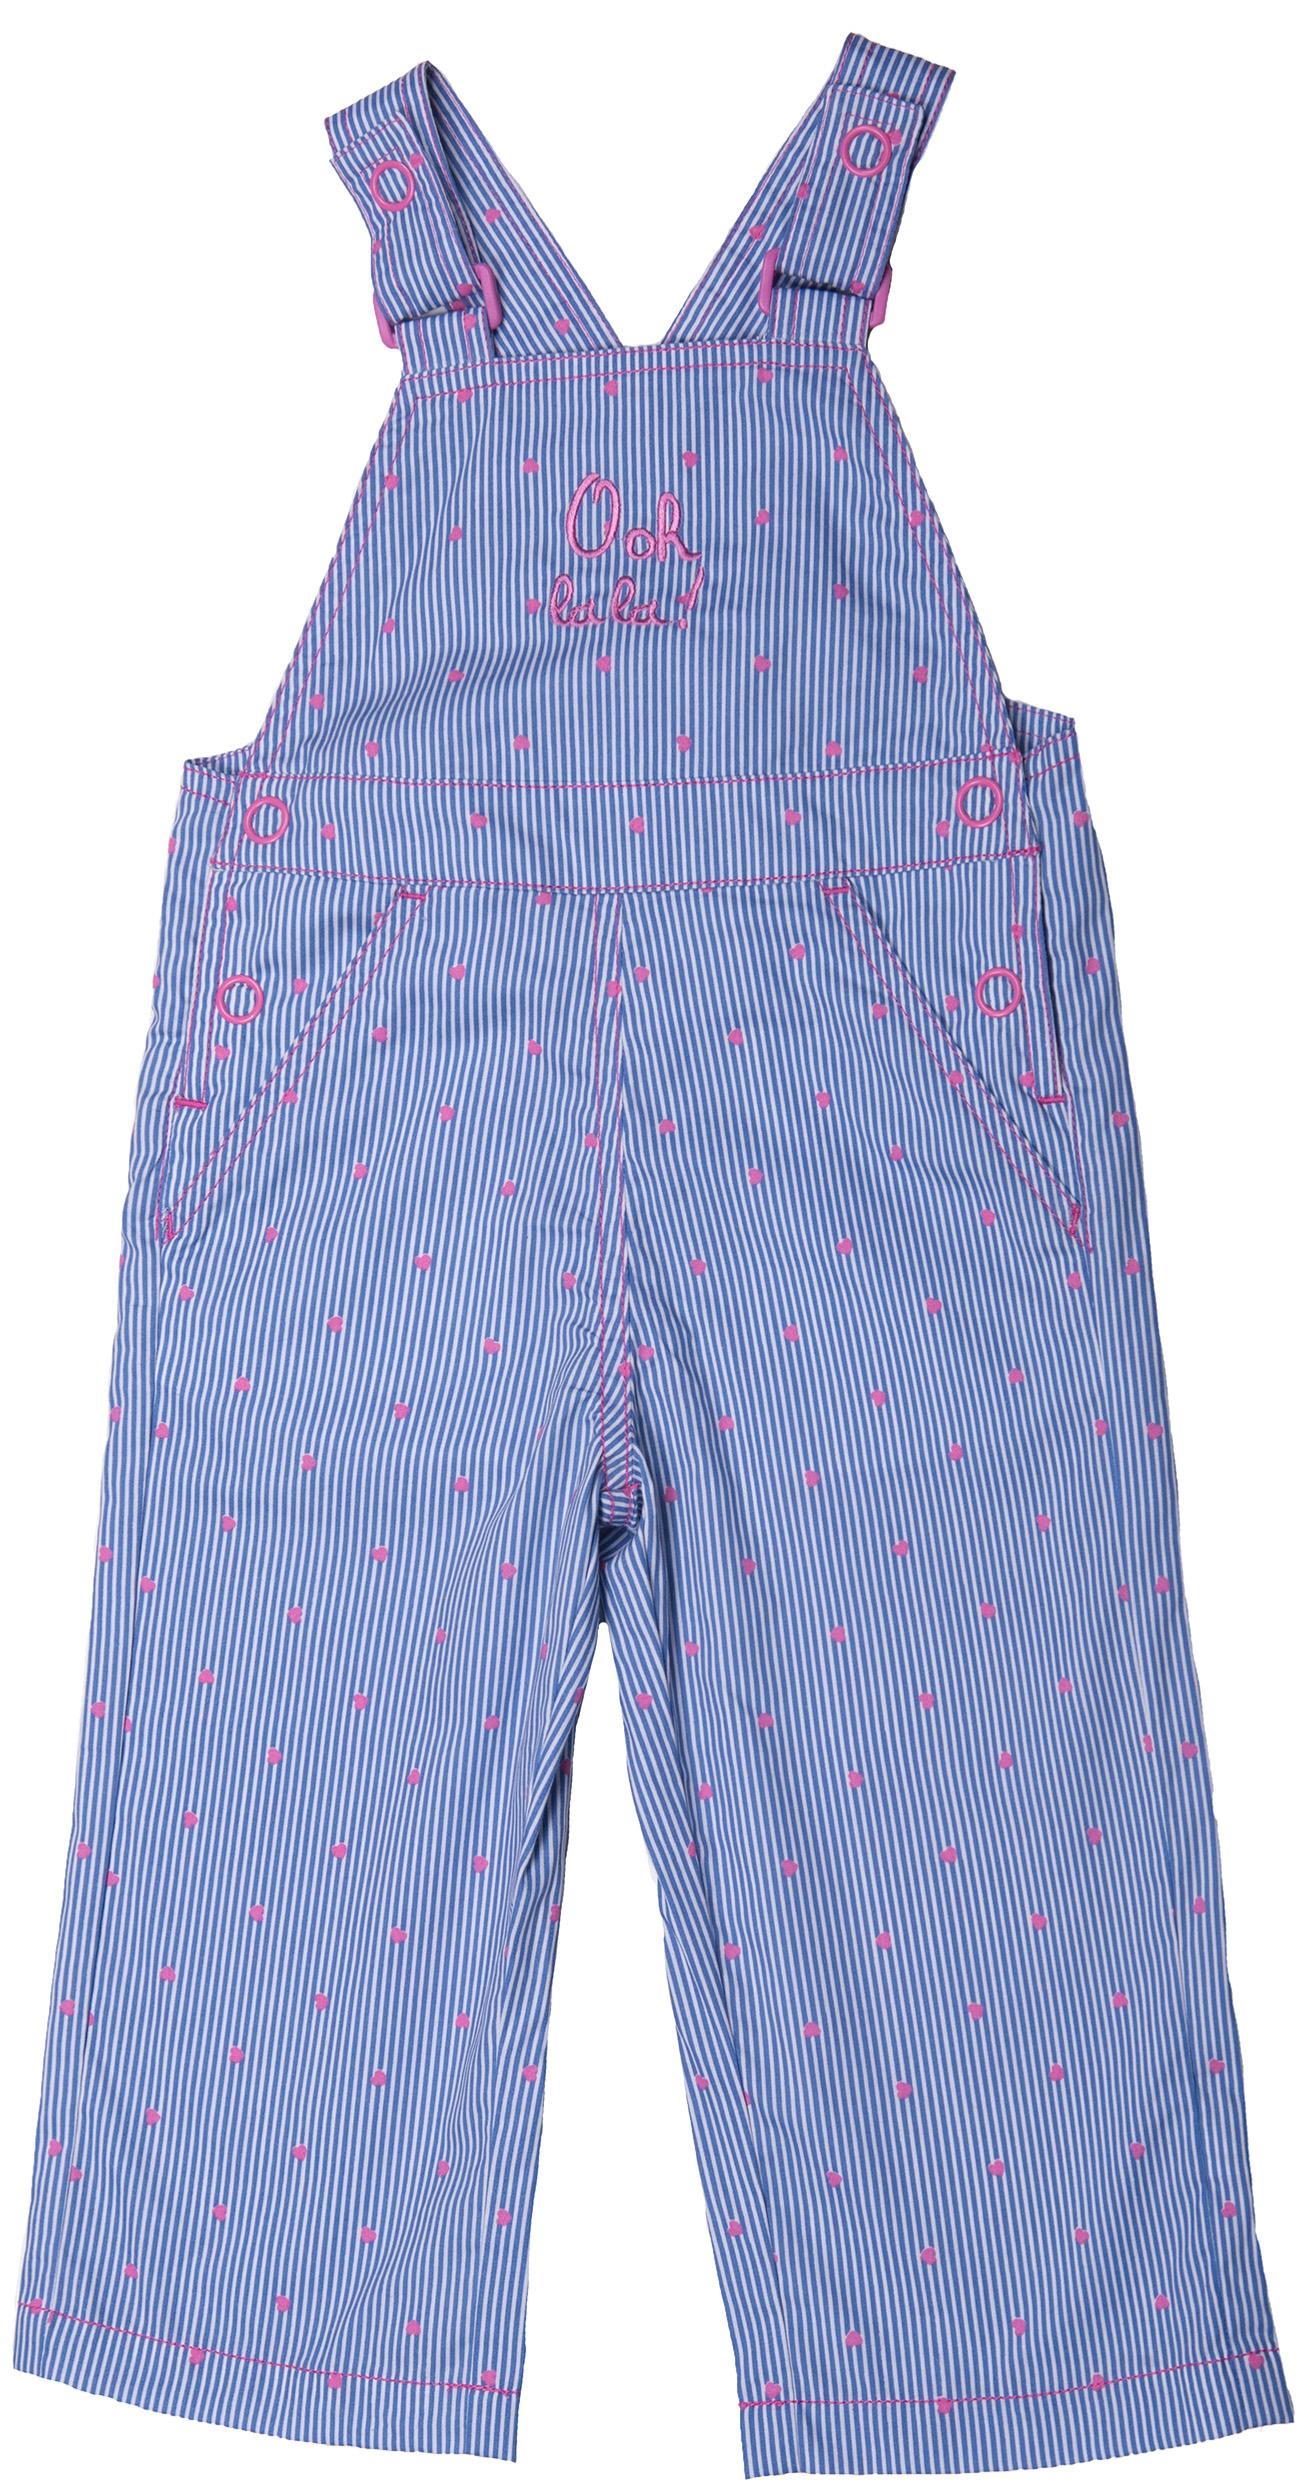 Полукомбинезон для девочки Barkito Солнечный берег 2 полукомбинезон джинсовый для девочки barkito деним